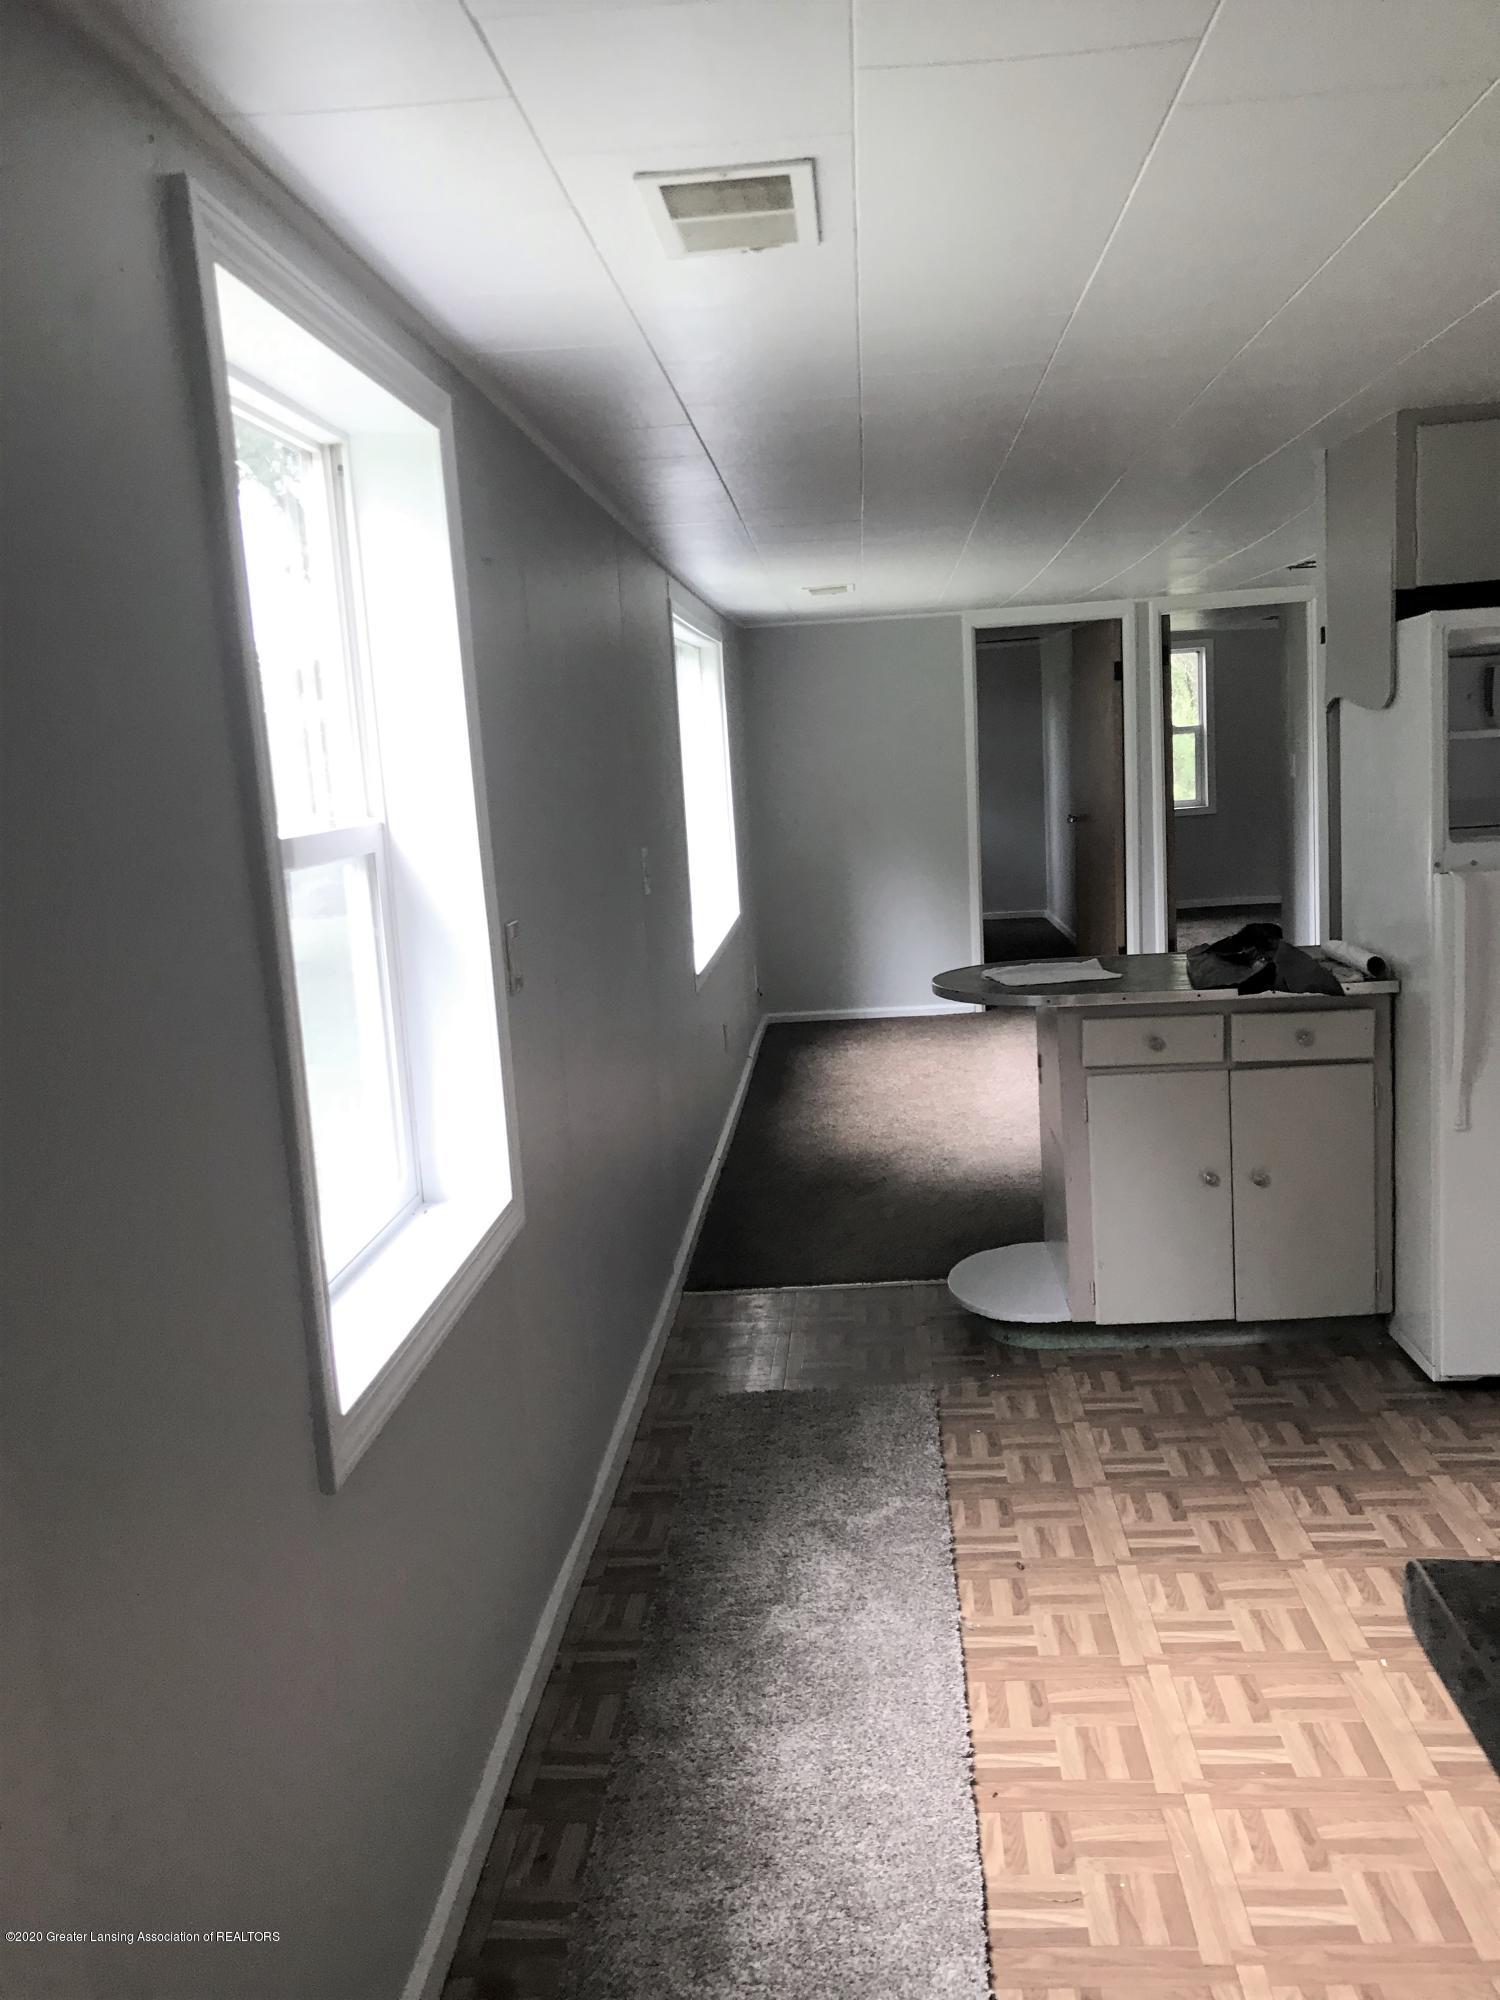 1247 W Vermontville Hwy - View 1 - 5